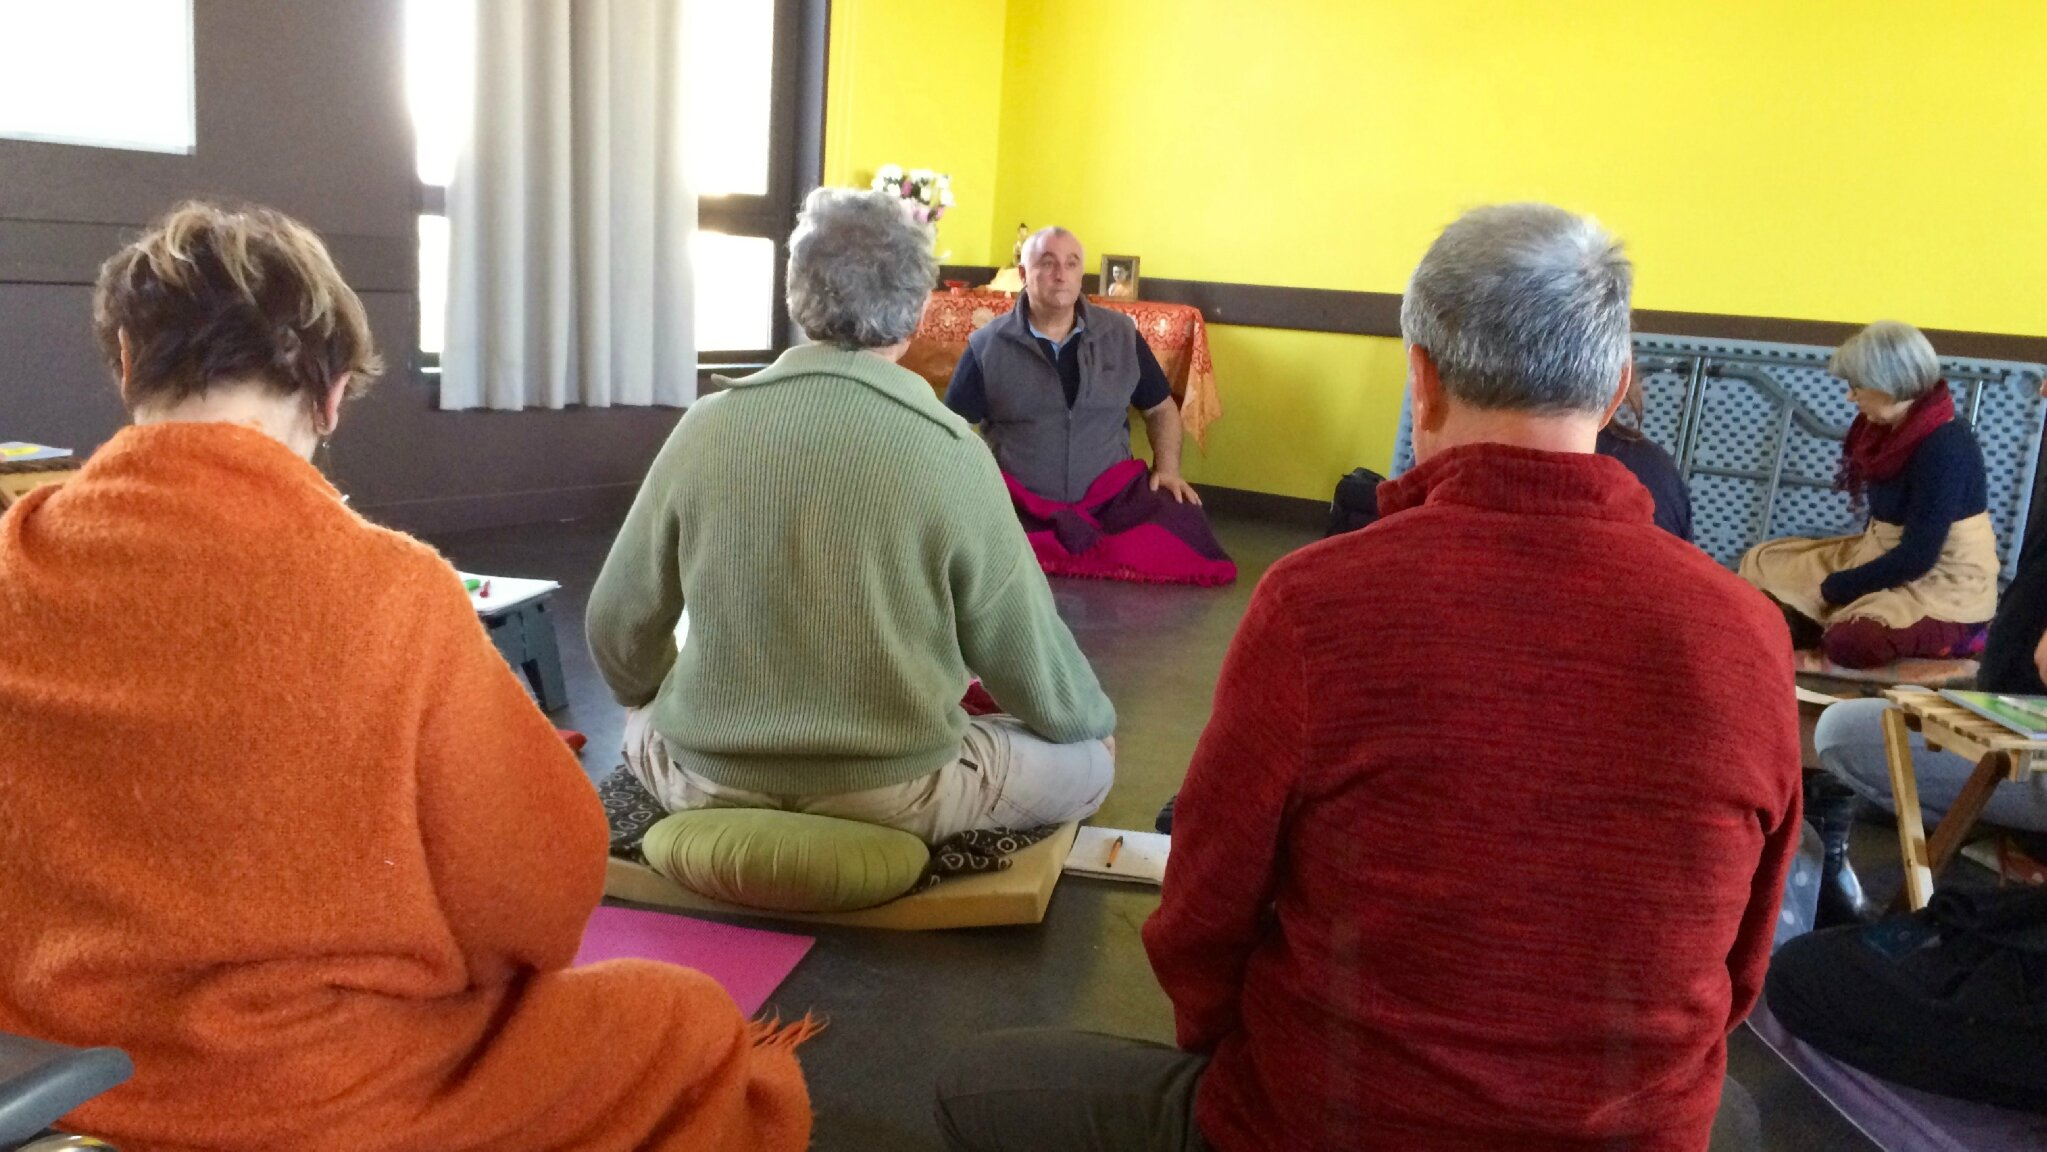 Méditation en soirée avec Lama Shedroup : Mercredi 17 Mai 2017